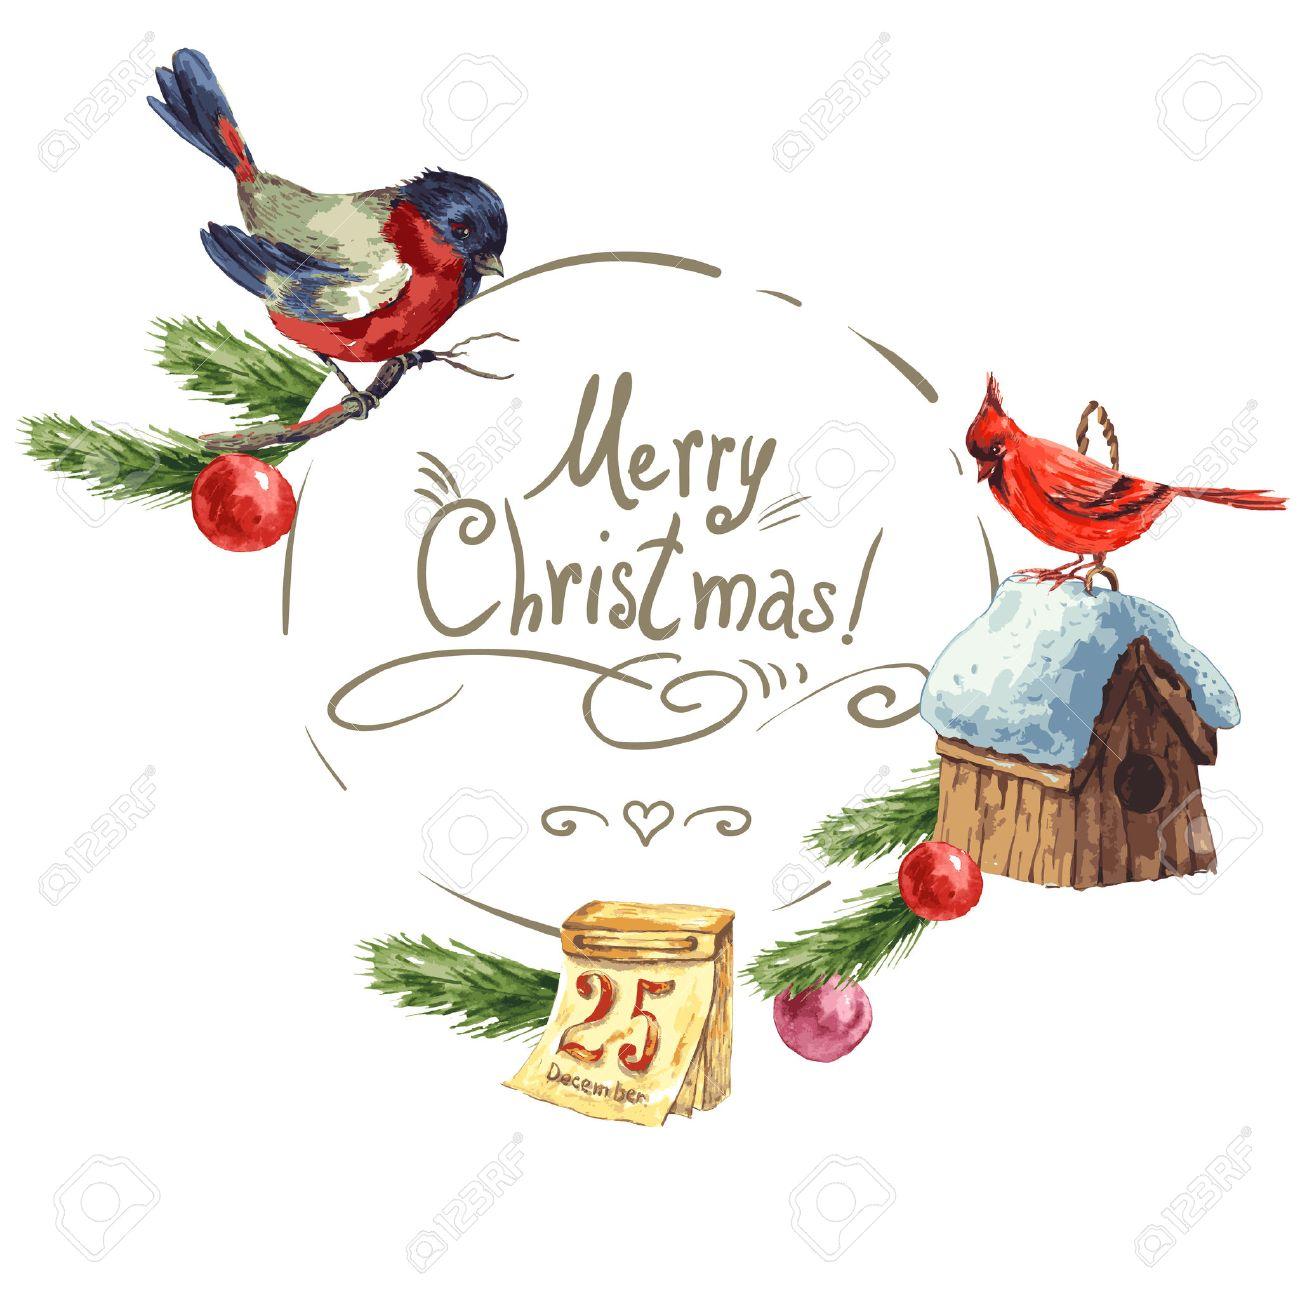 Winter Greeting Card With Bullfinch Birdhouse Christmas Tree